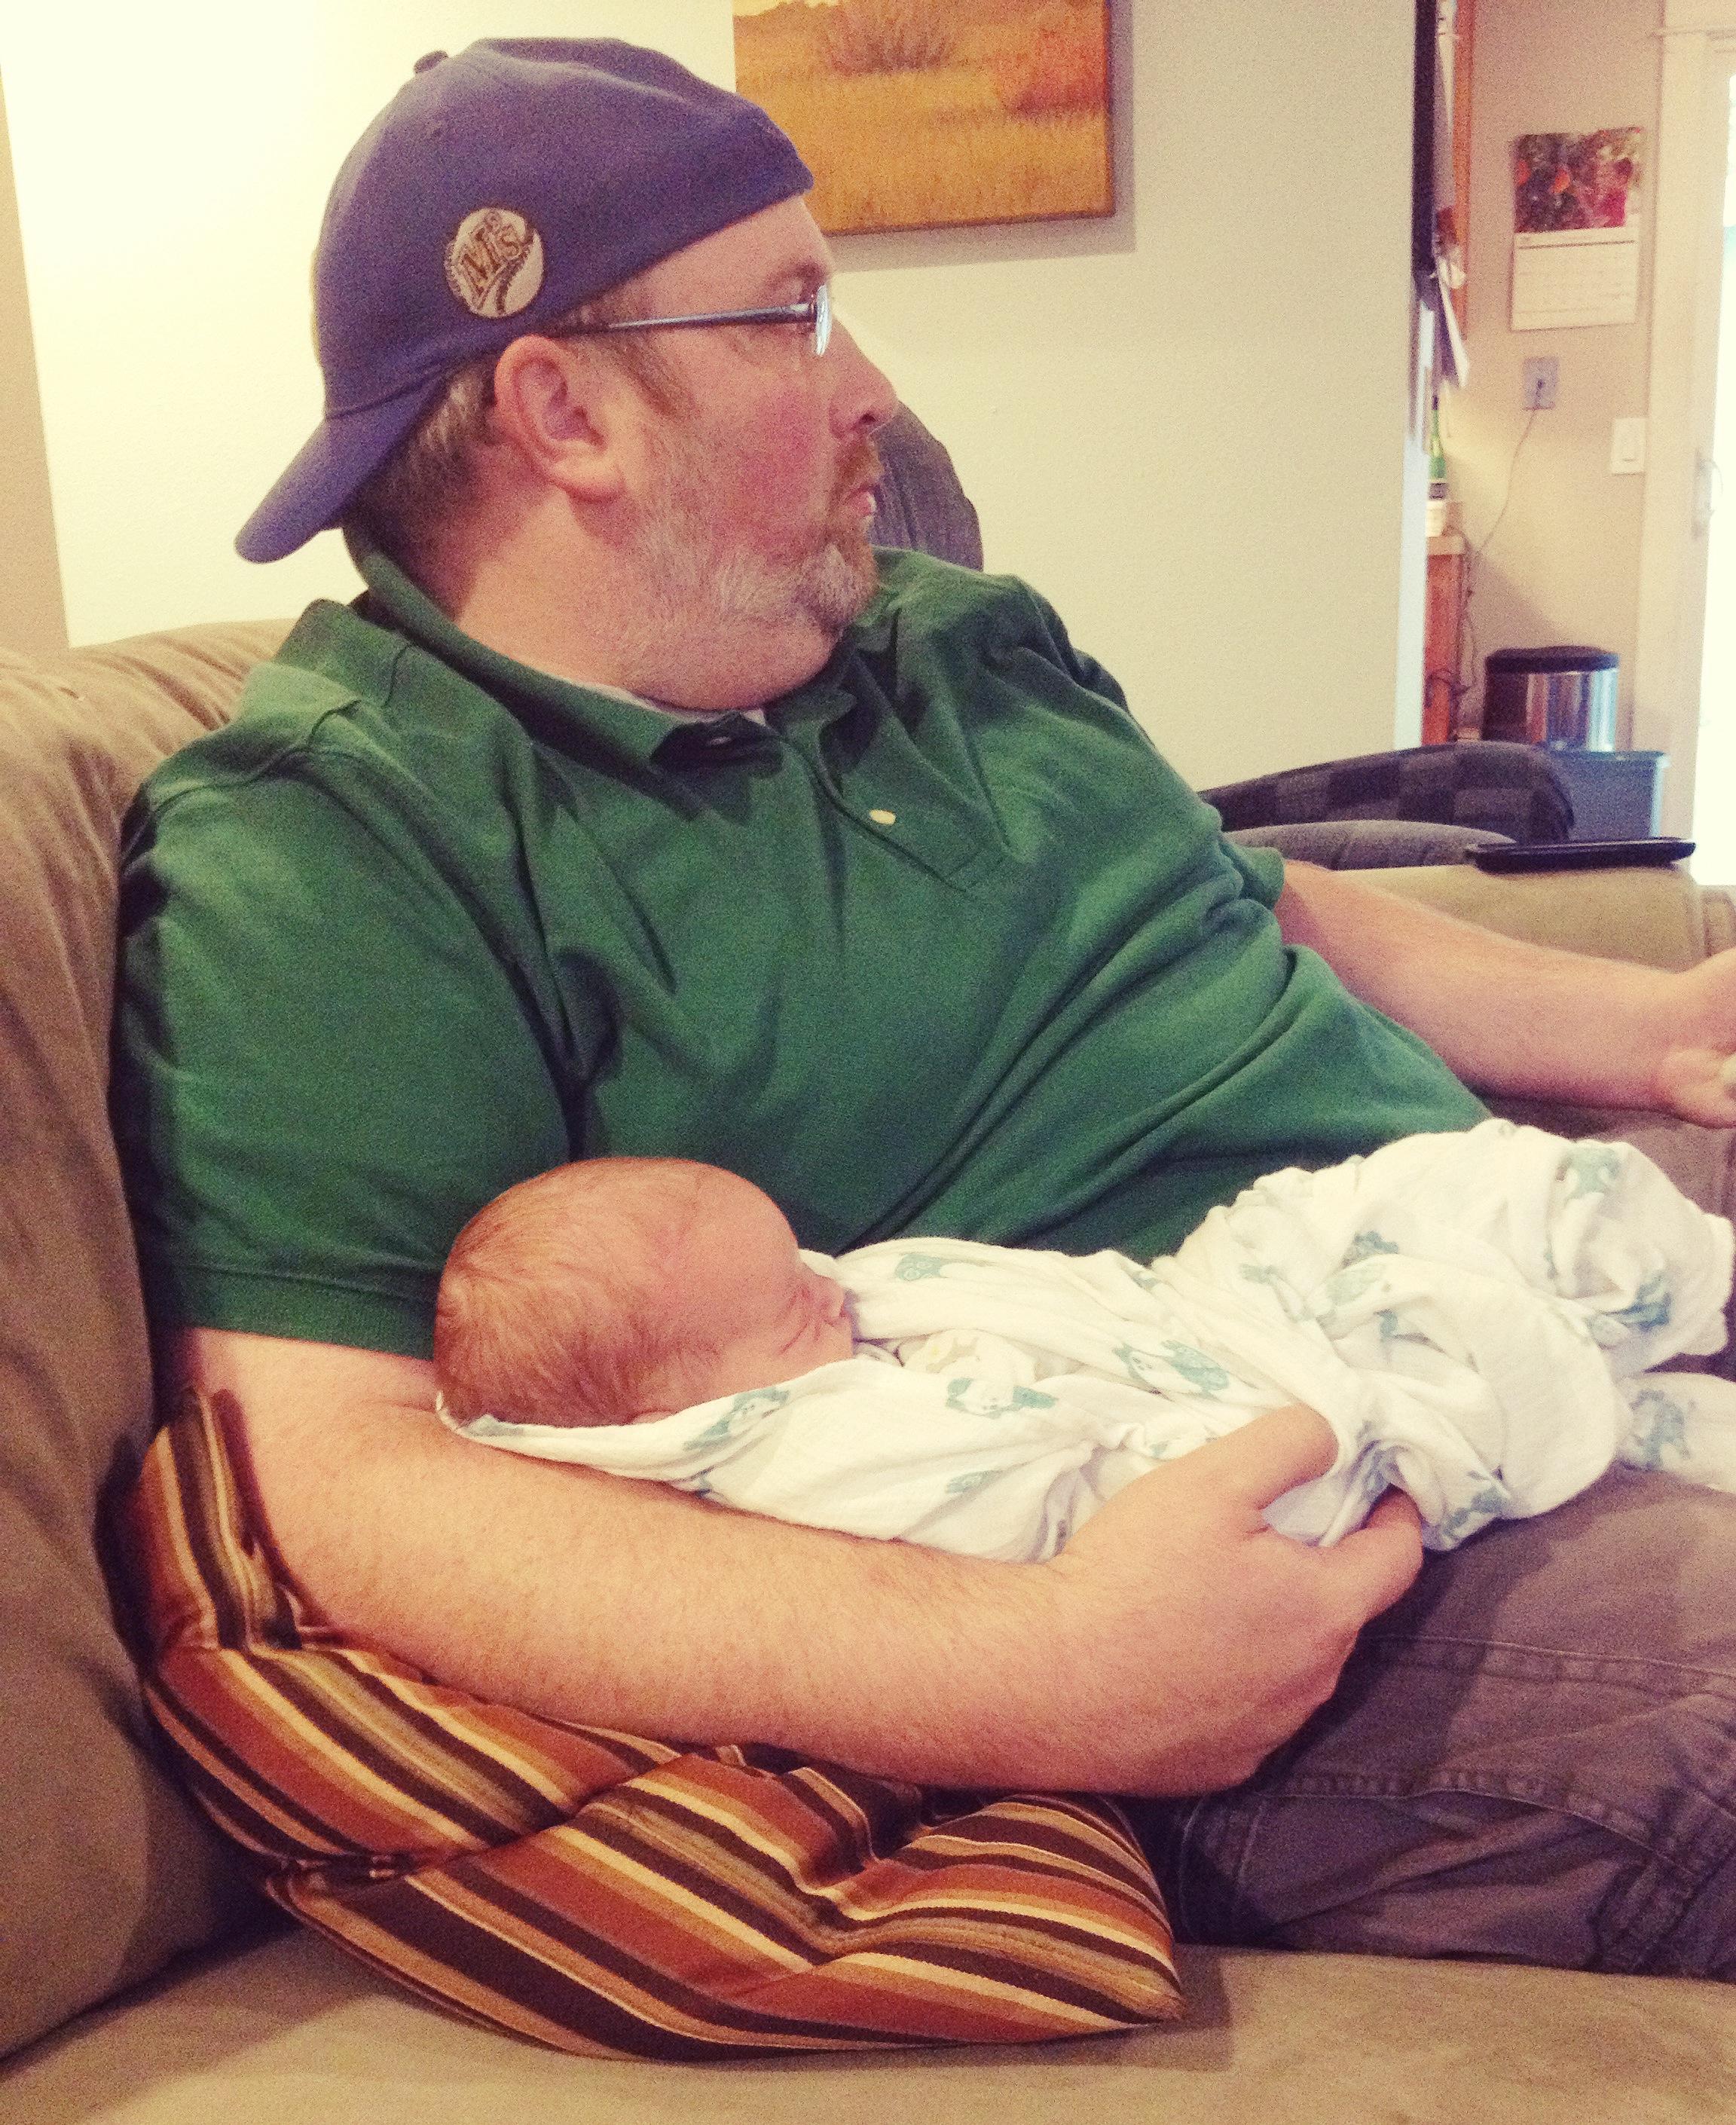 Doing paternity leave like a boss